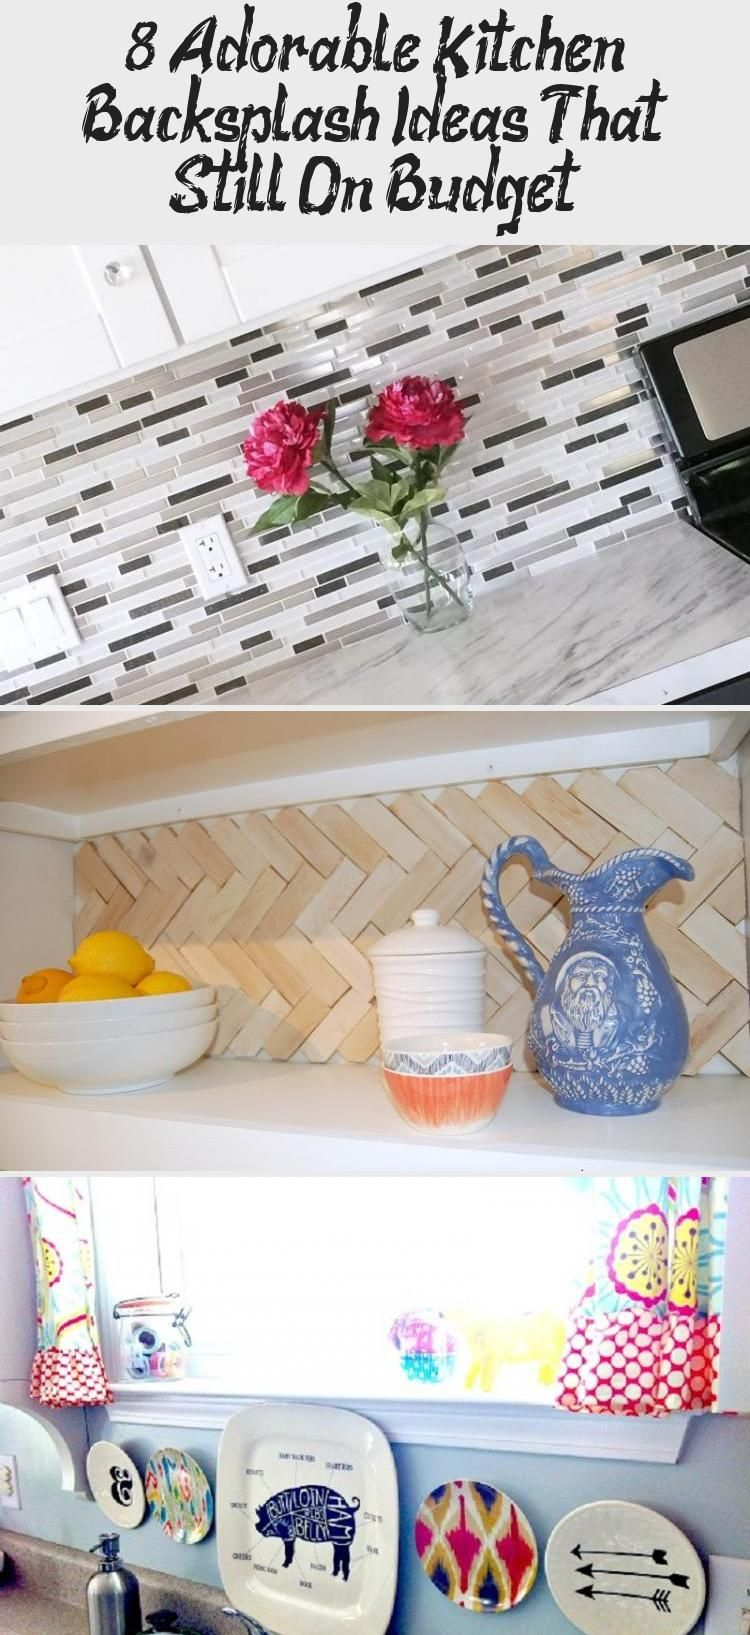 8 Adorable Kitchen Backsplash Ideas That Still On Budget – KTCHN Kitchen